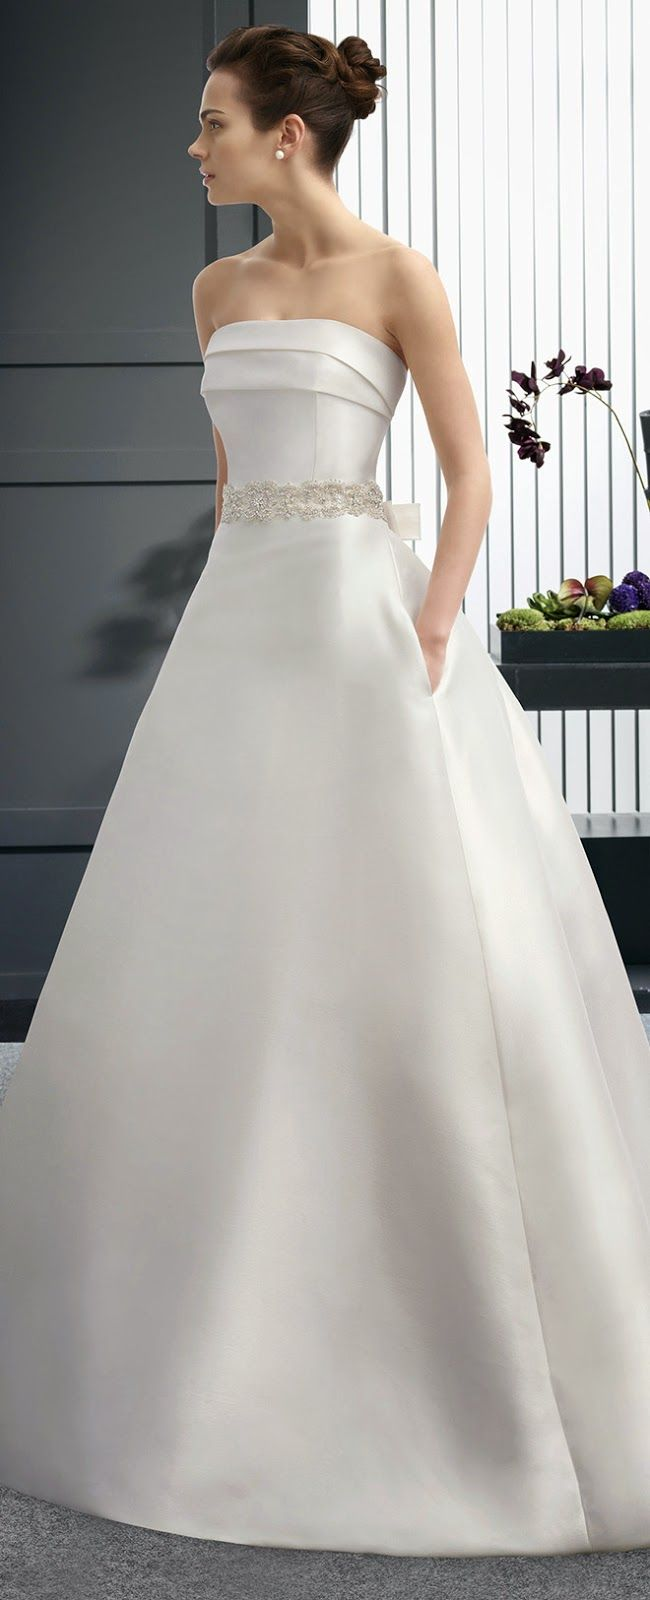 Wedding-Dresses-0542